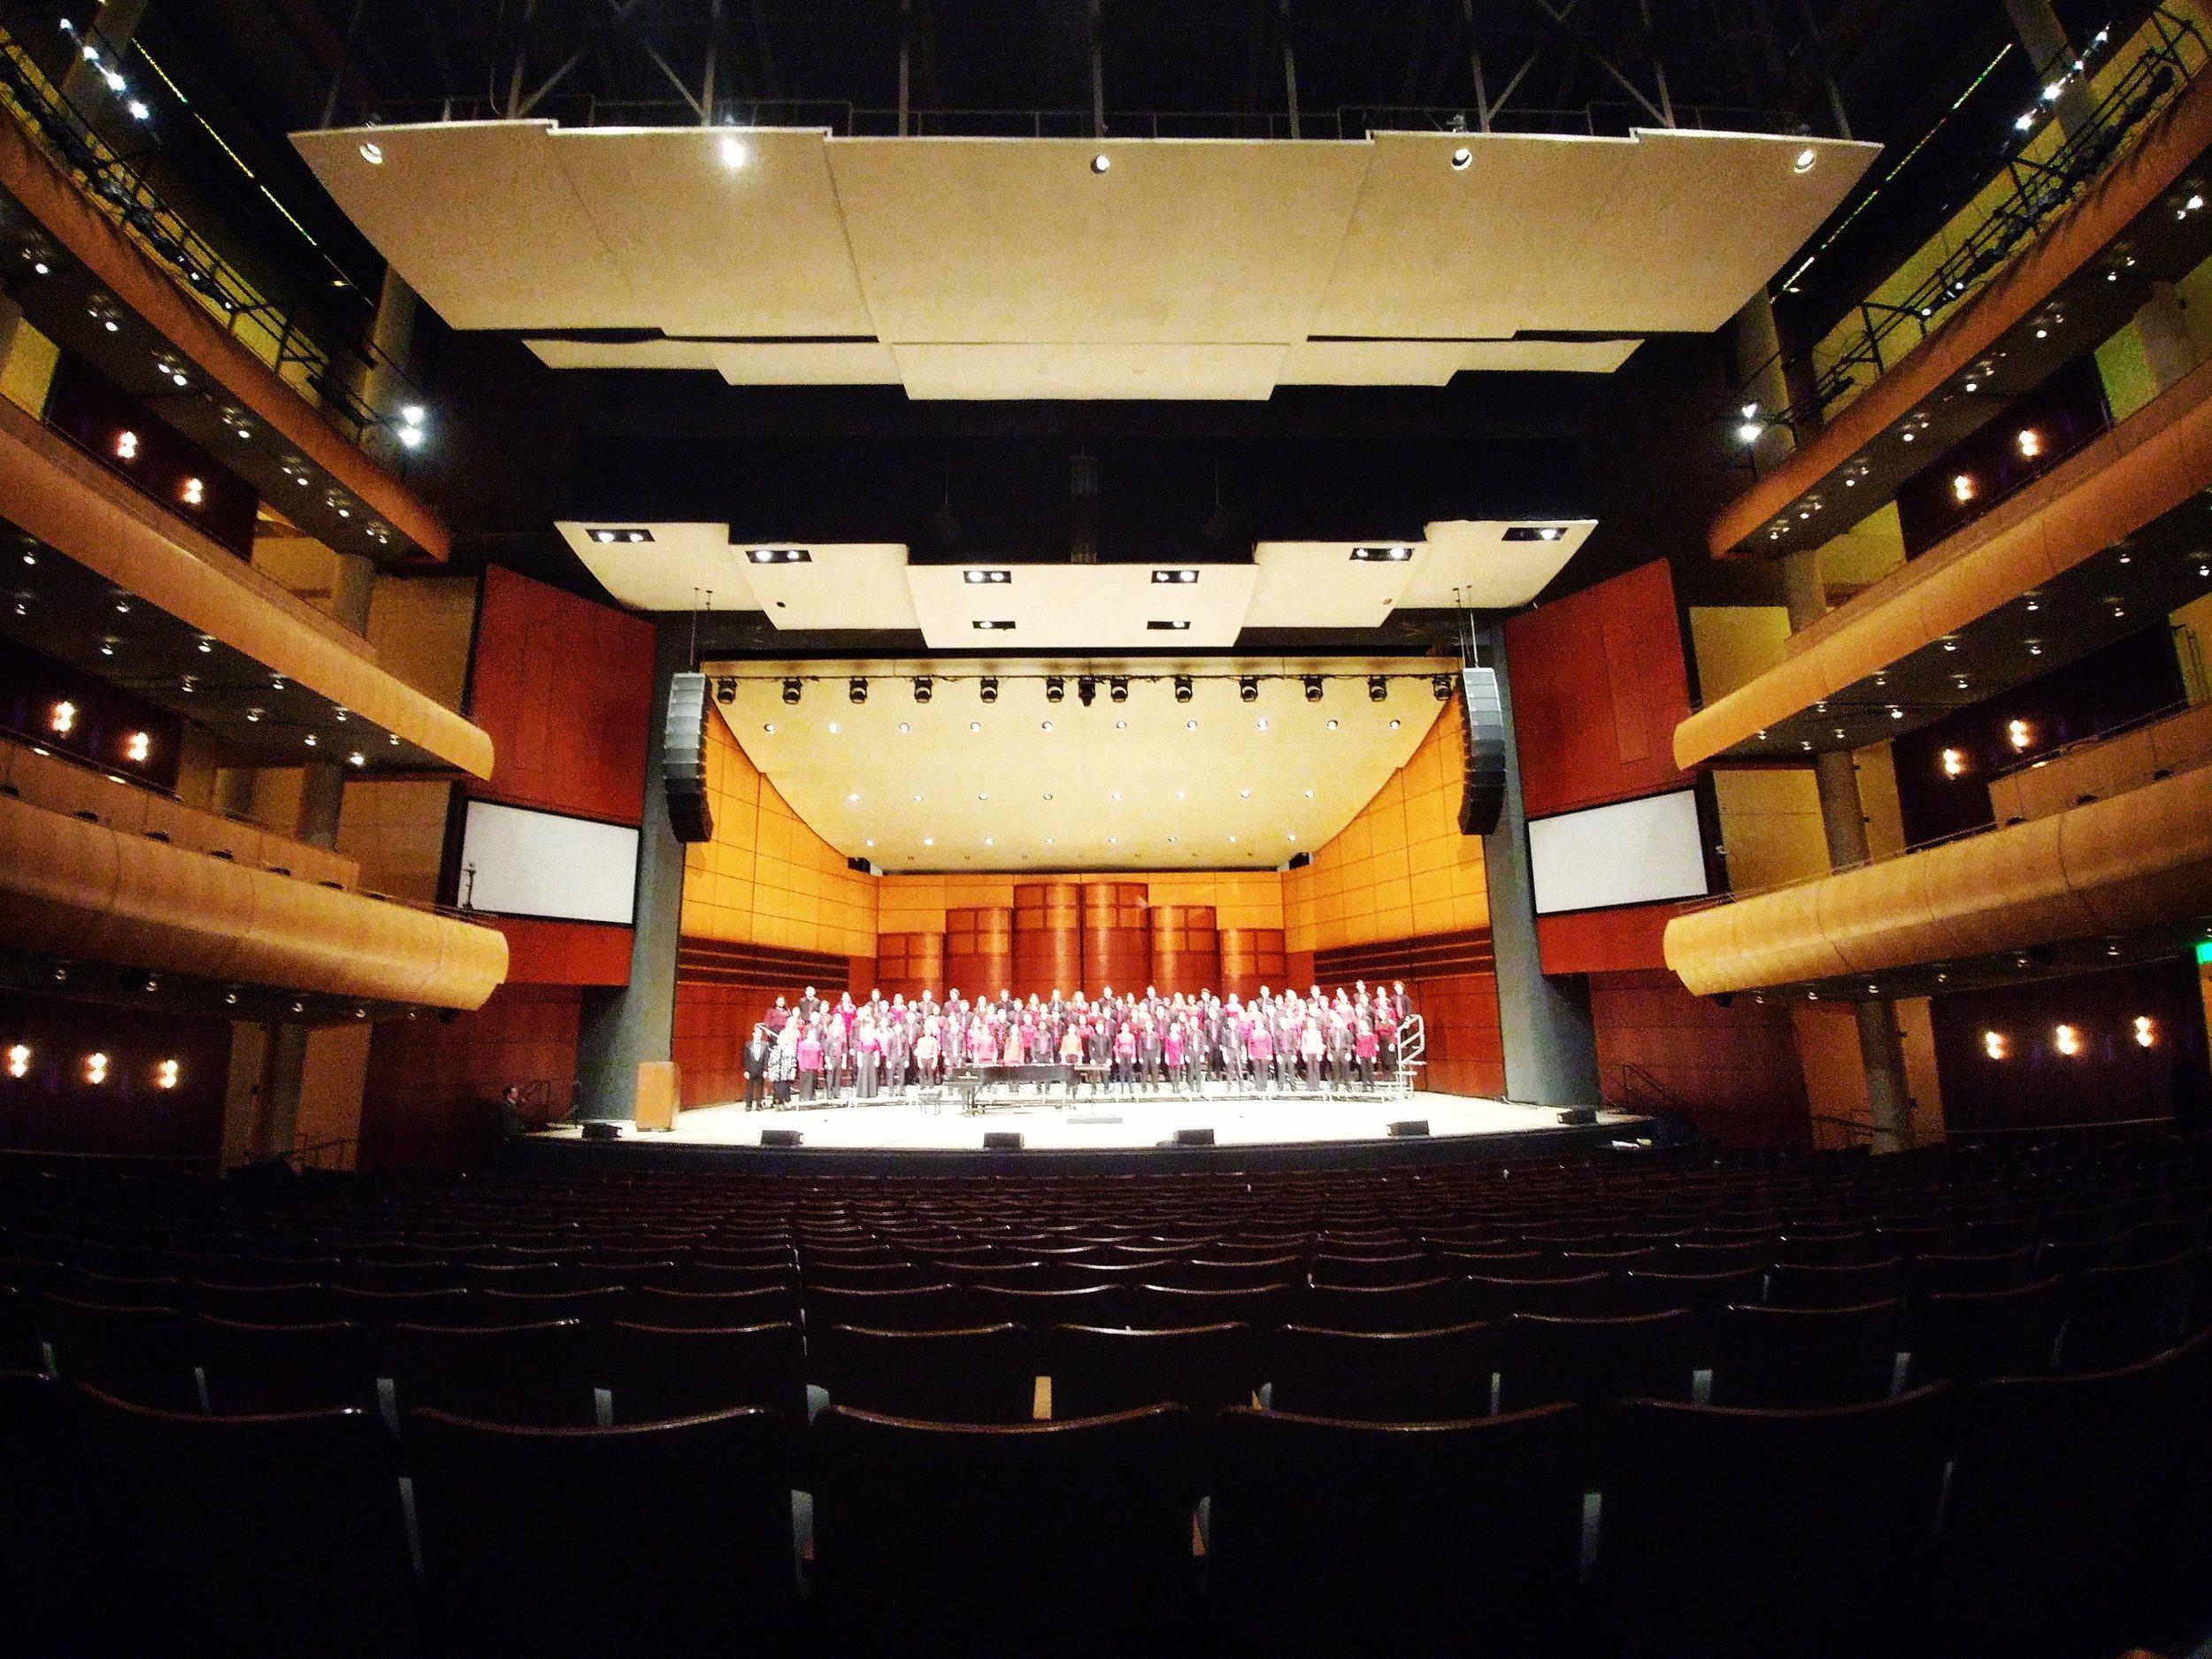 MSVMA Honors Choir in rehearsal.